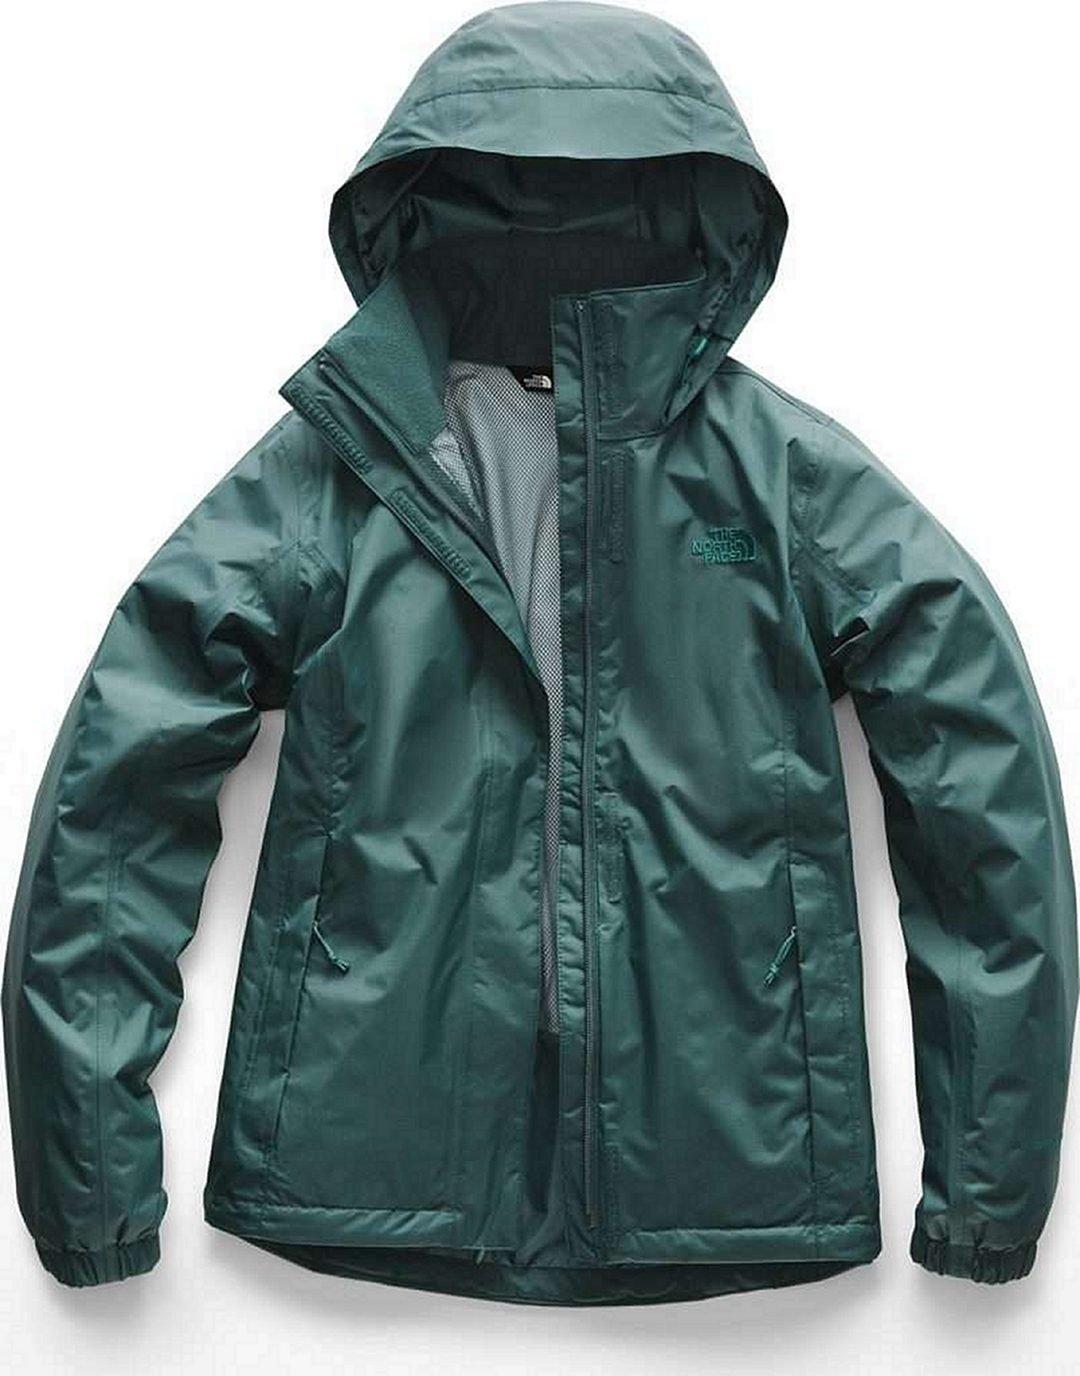 The NorthFace RESOLVE II Jacket